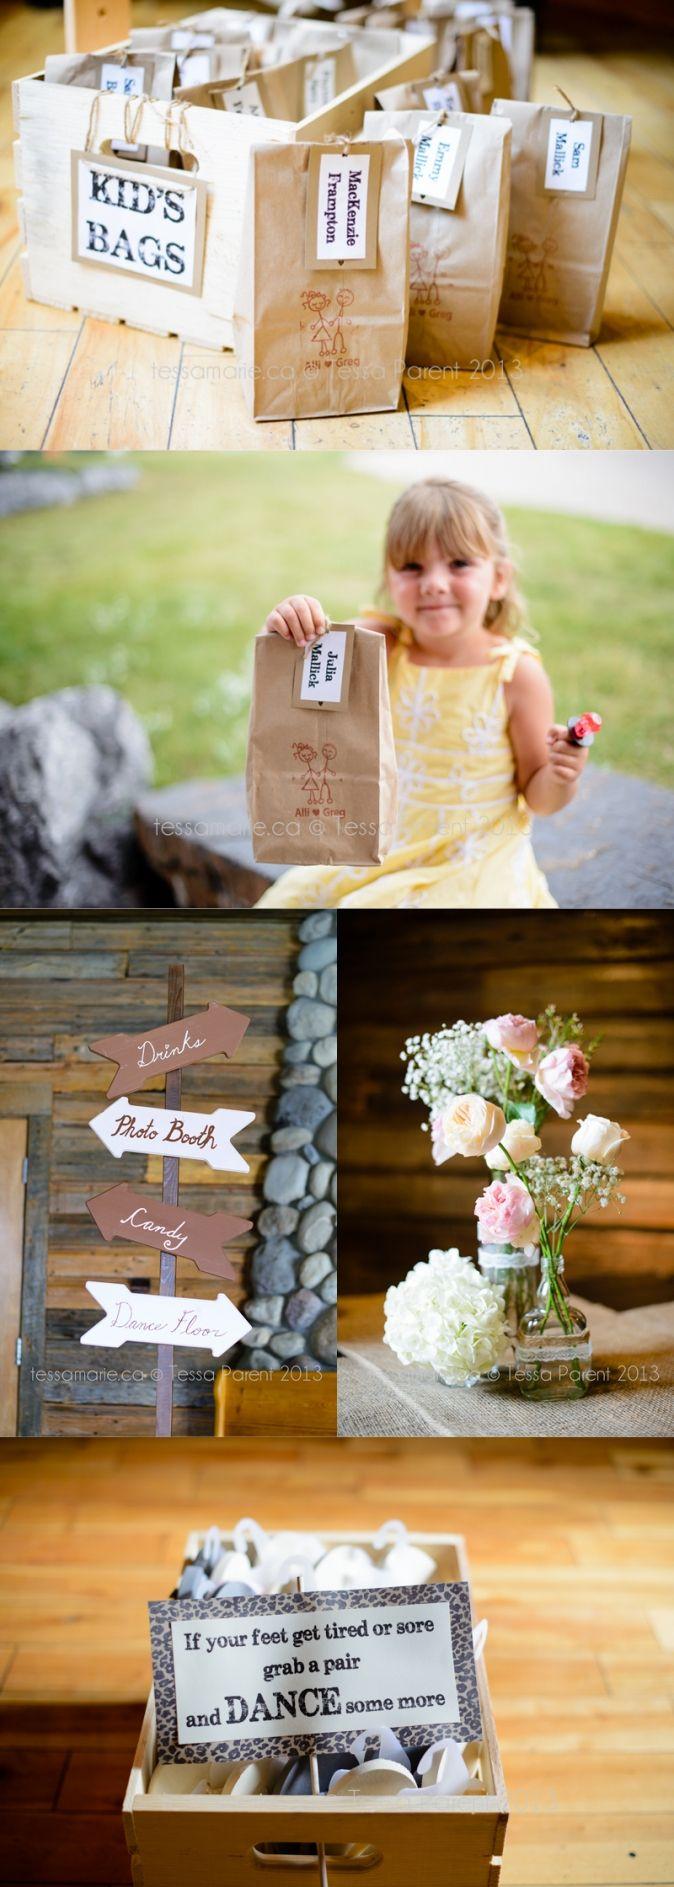 Kids wedding treat bags, Canmore AB wedding, Calgary wedding photographer www.tessamarie.ca